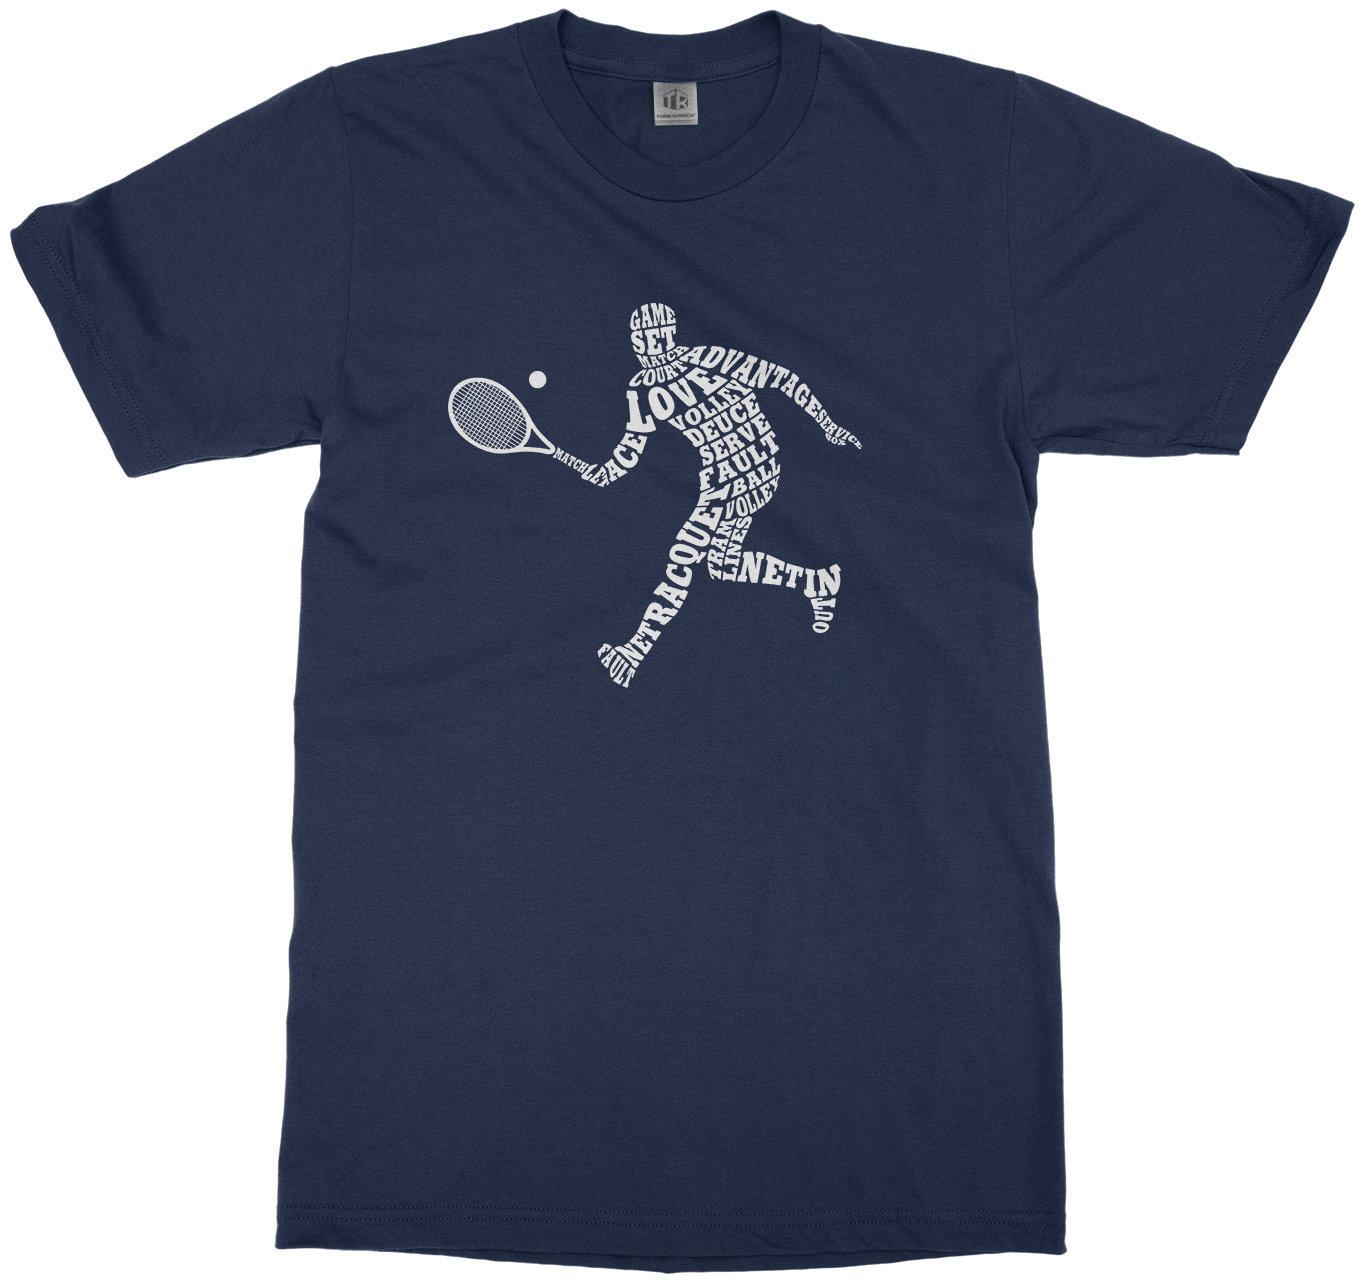 Boys Tennis Player Typography - Boys Youth Long And Short Sleeve T-shirt Unisex Tshirt